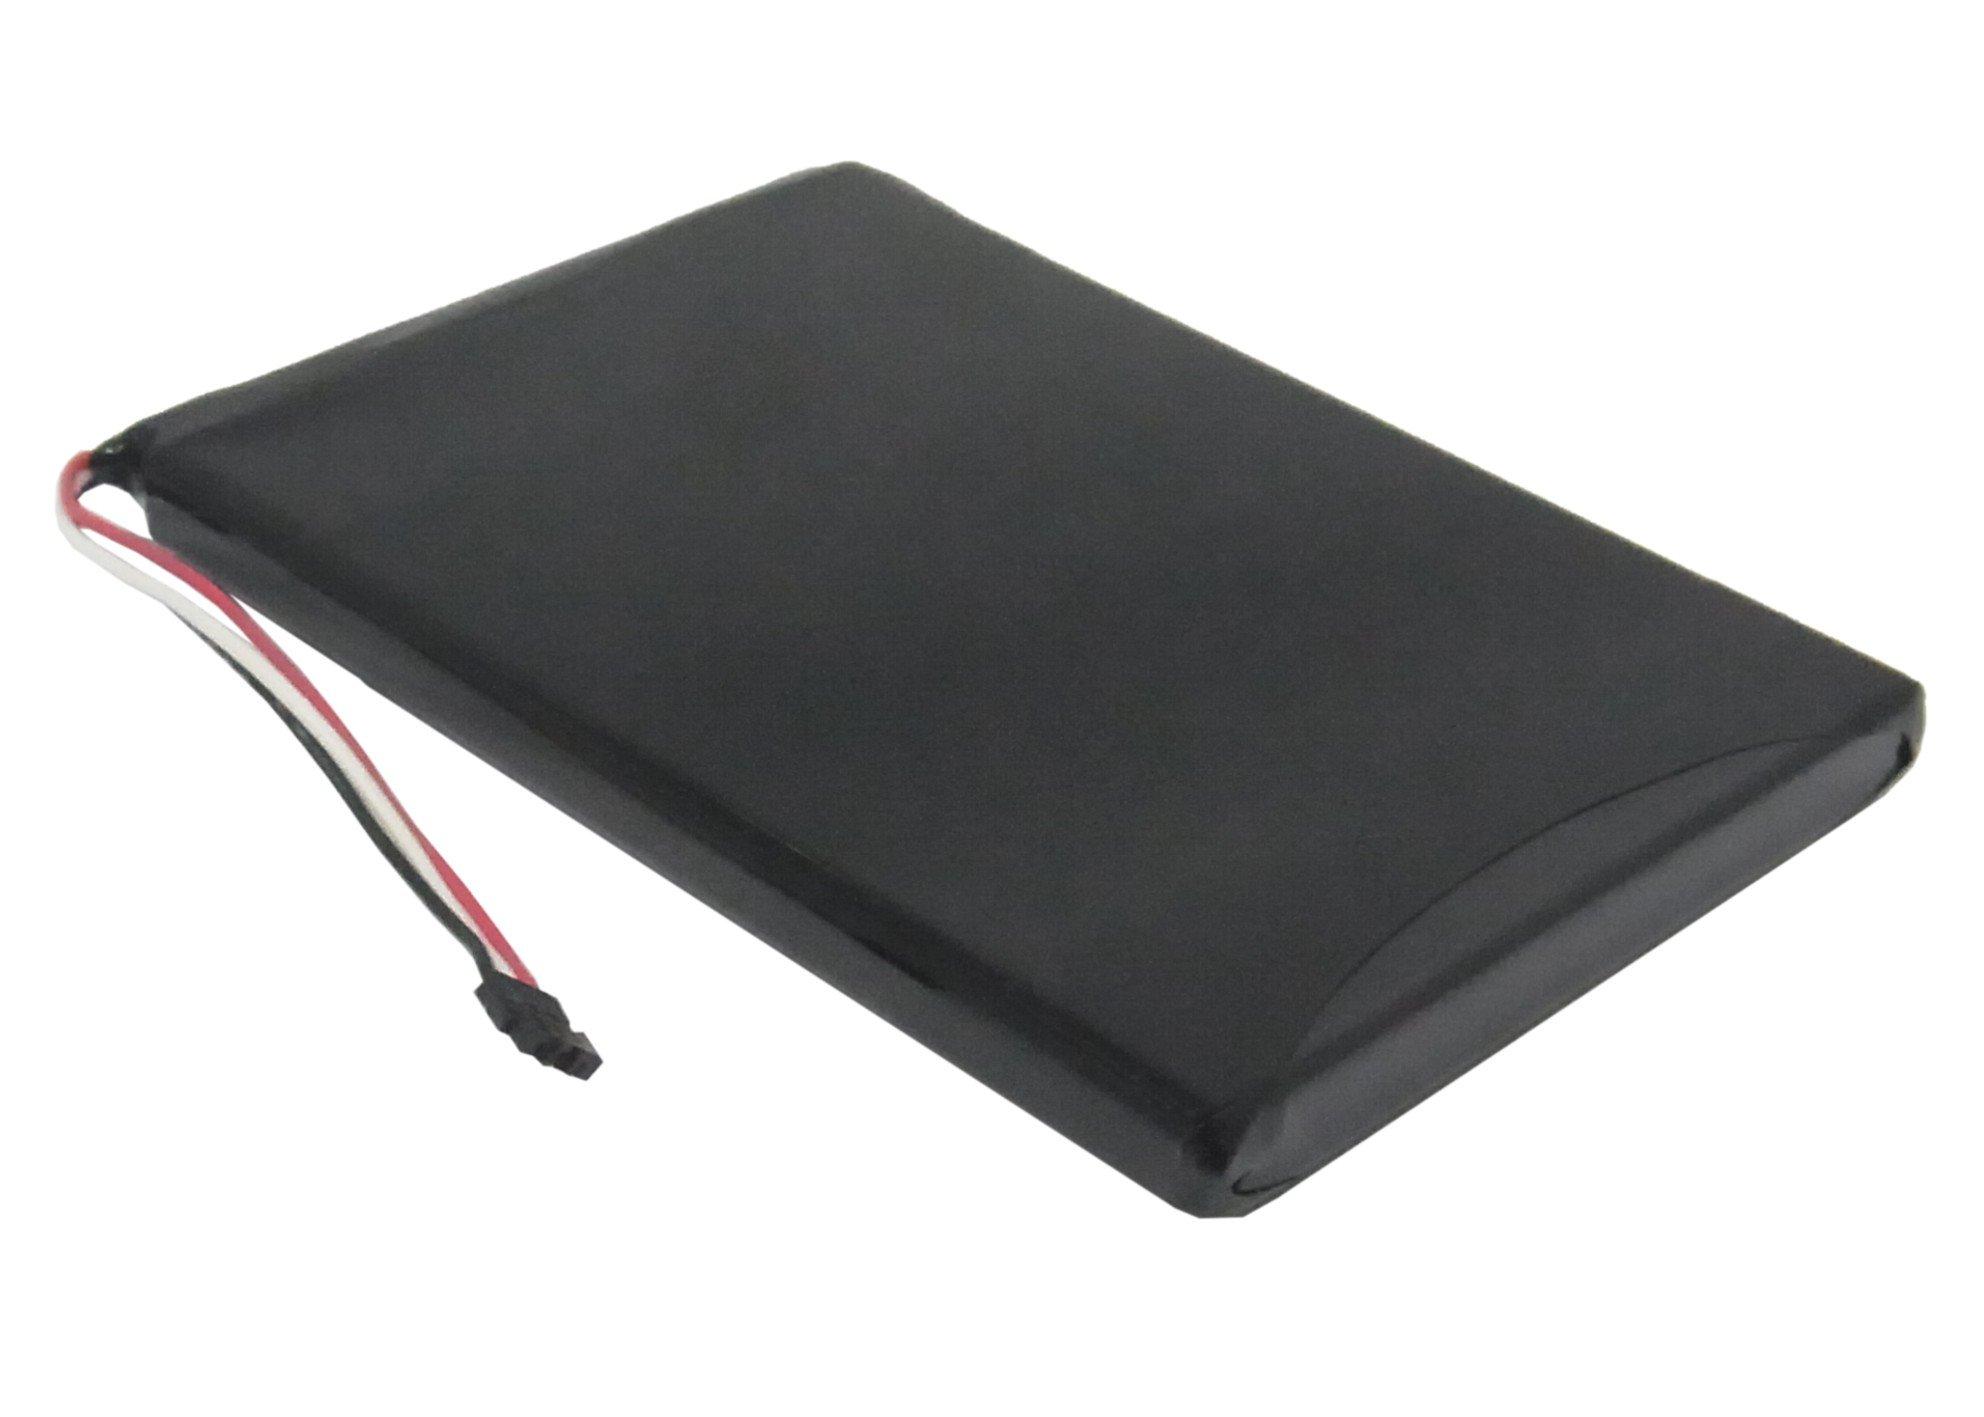 Replacement Battery for Garmin 361-00066-00, Fit Garmin Nuvi 2797,Nuvi 2757,3.70V,1500mAh,Li-ion by Cameron Sino (Image #4)